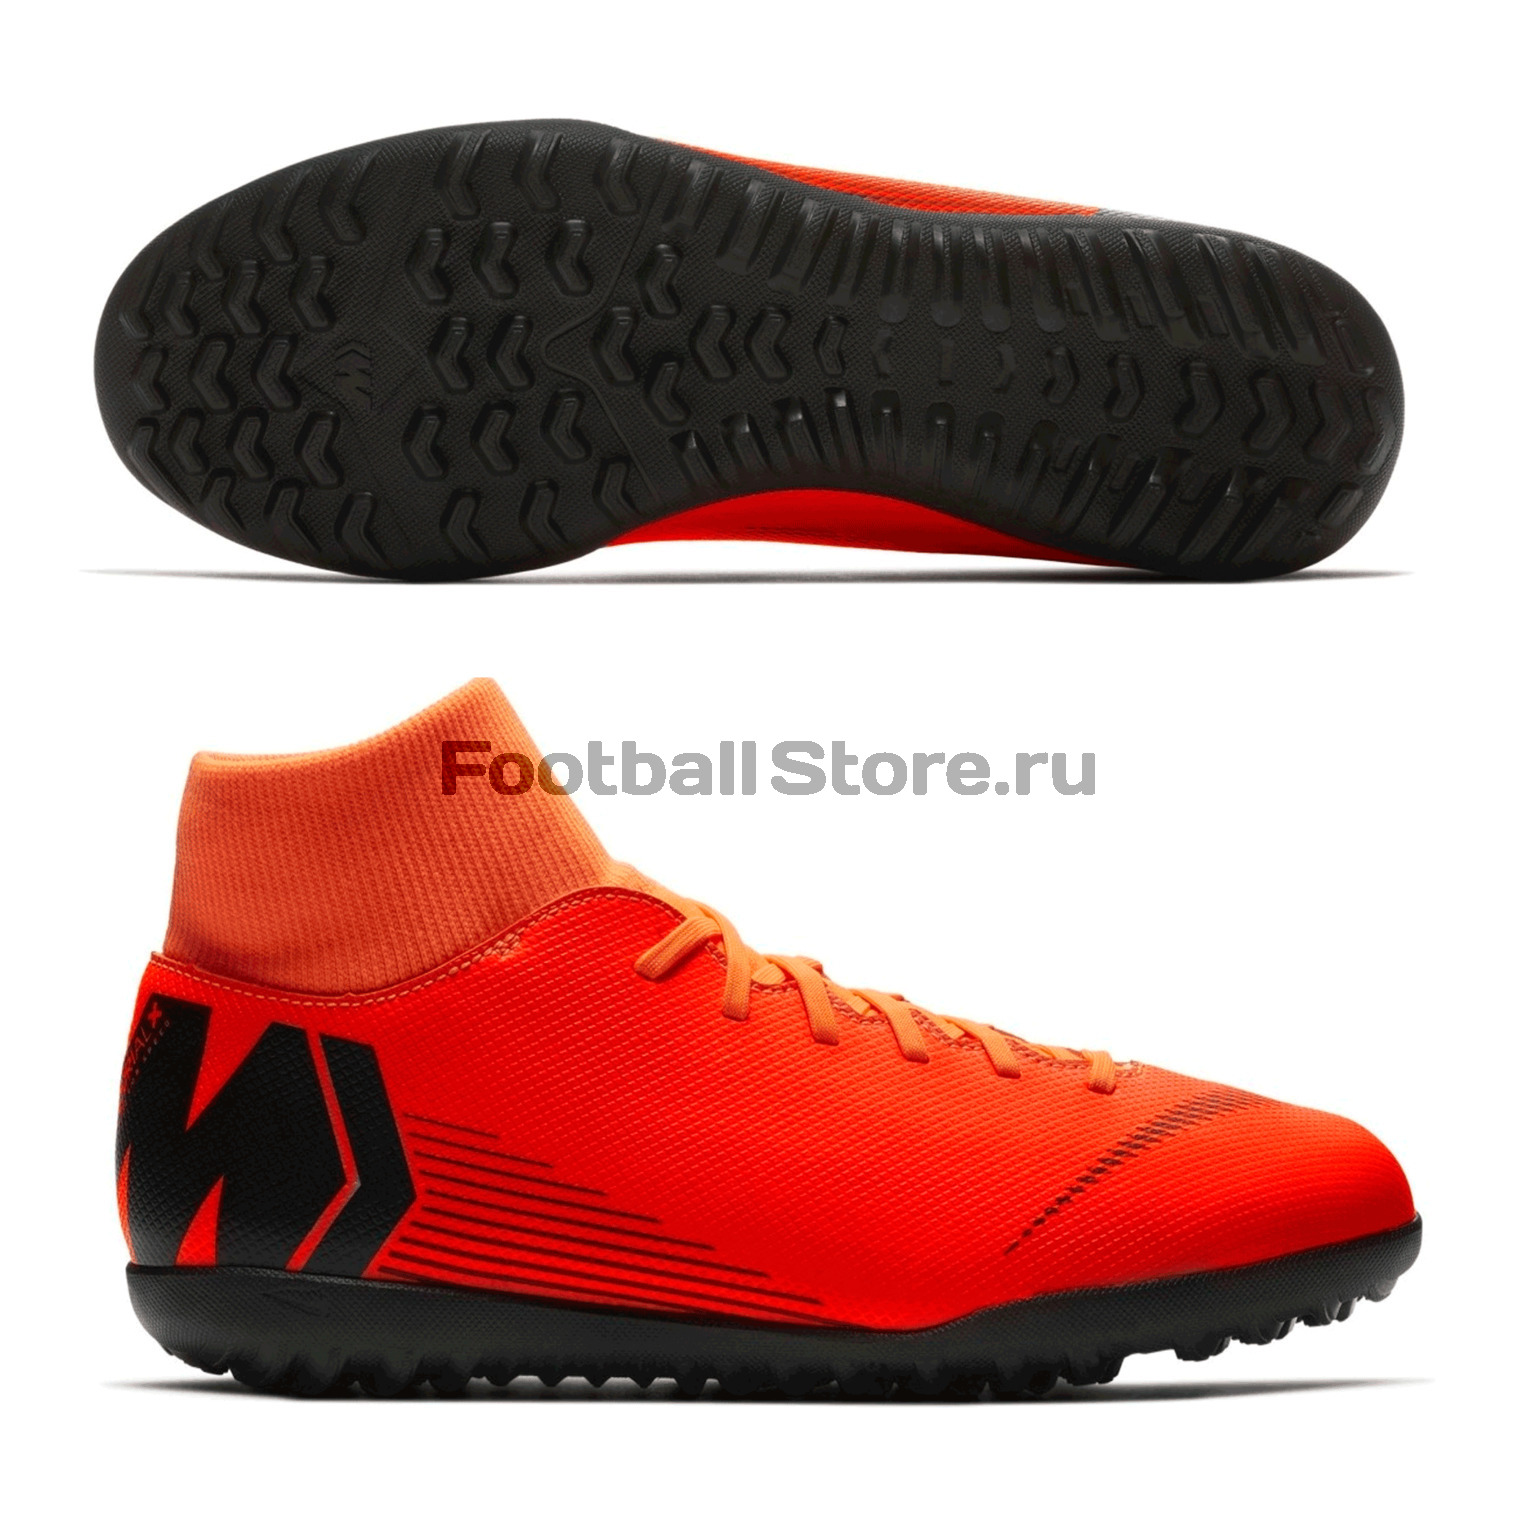 Шиповки Nike SuperflyX 6 Club TF AH7372-810 nike бутсы для мальчиков nike phantomx 3 club tf